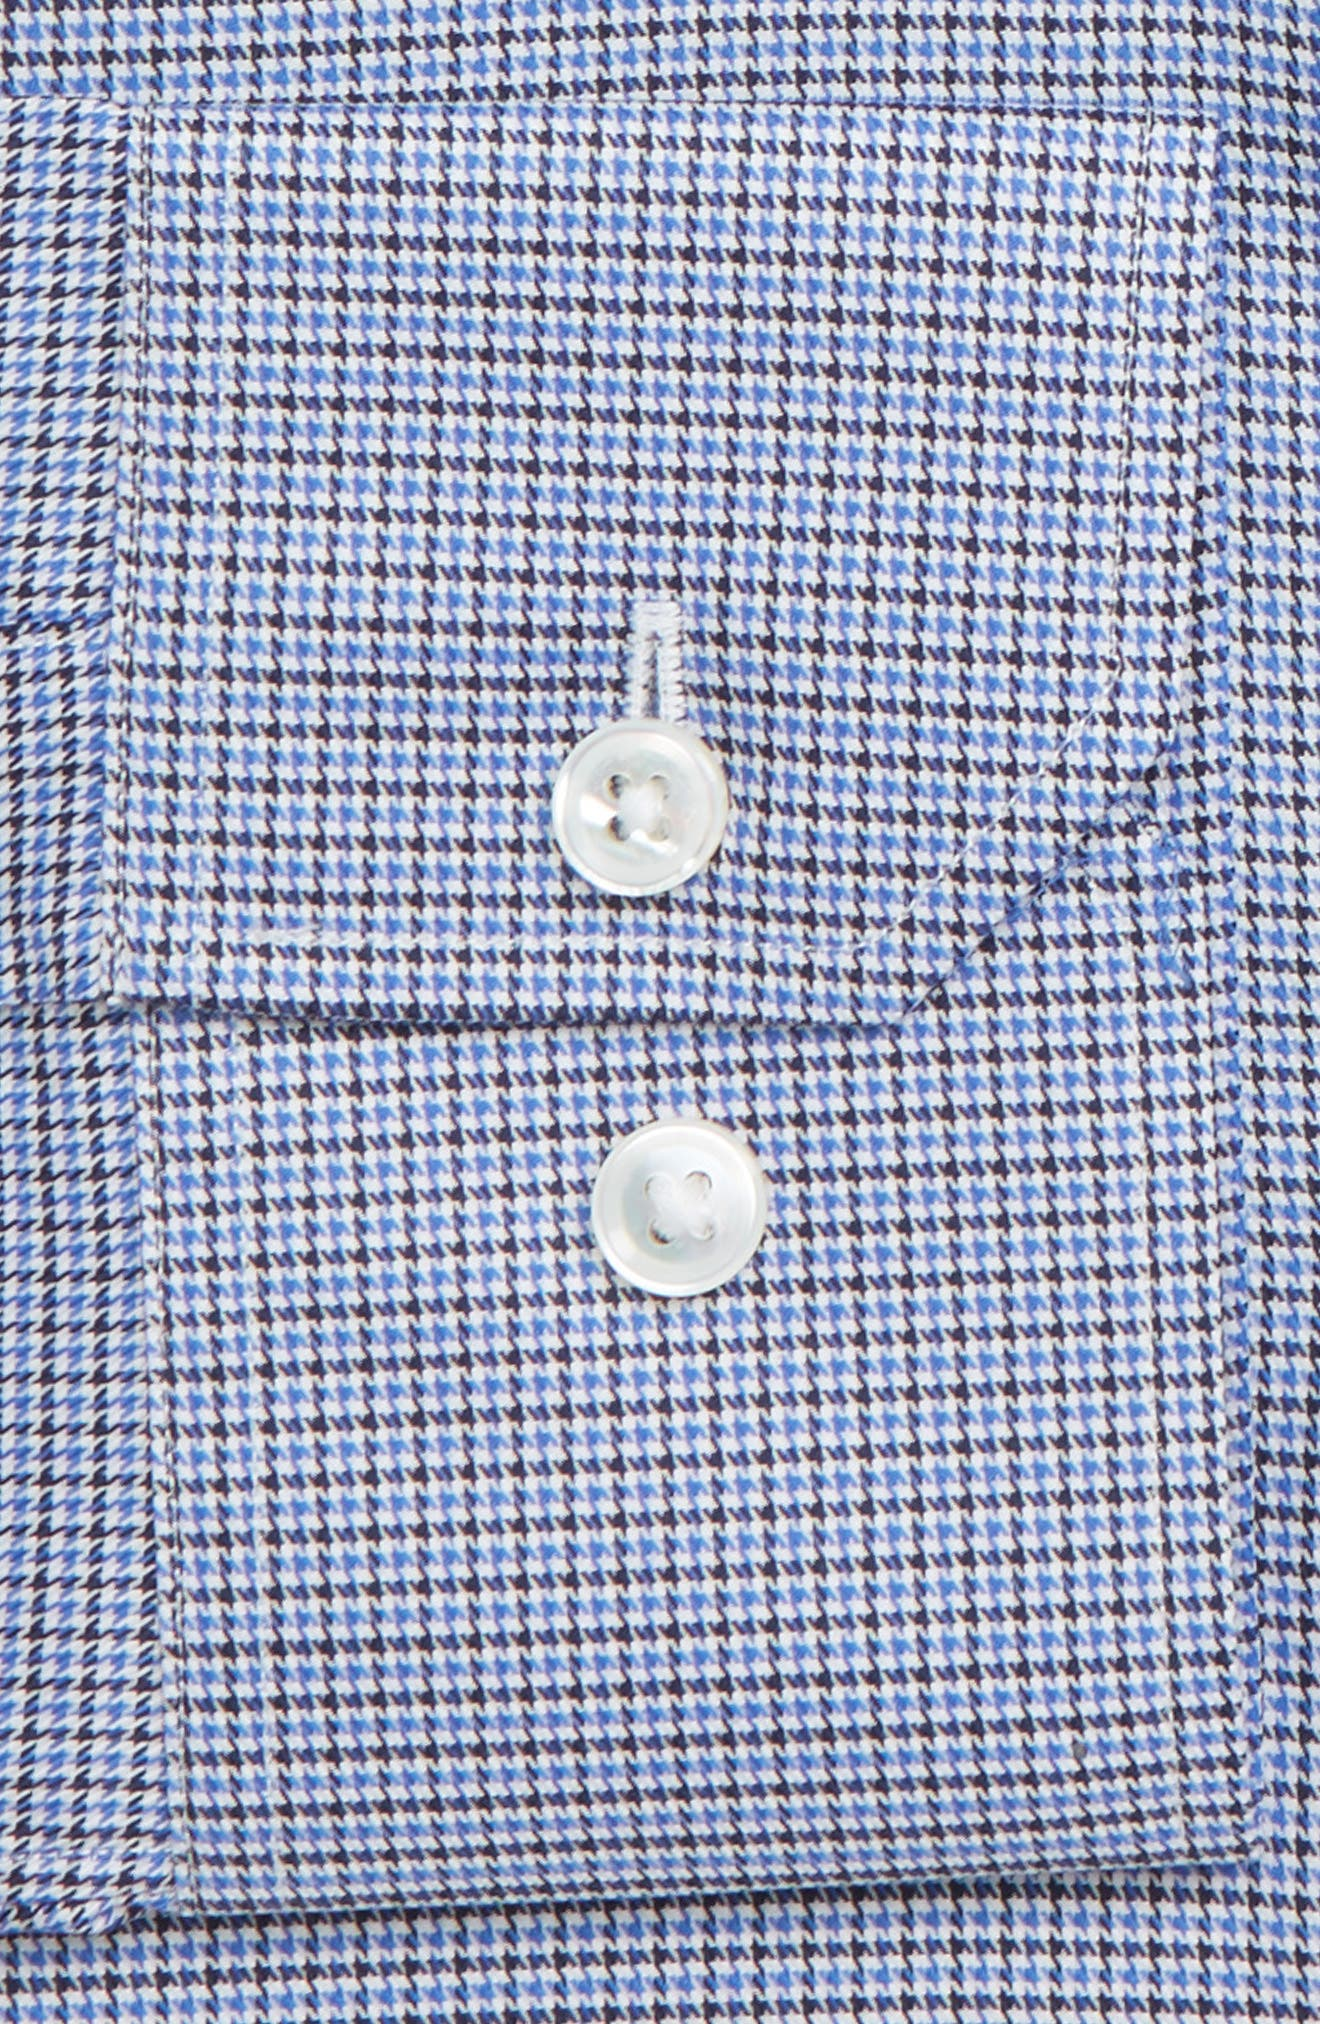 Efford Slim Fit Check Dress Shirt,                             Alternate thumbnail 2, color,                             MARINE